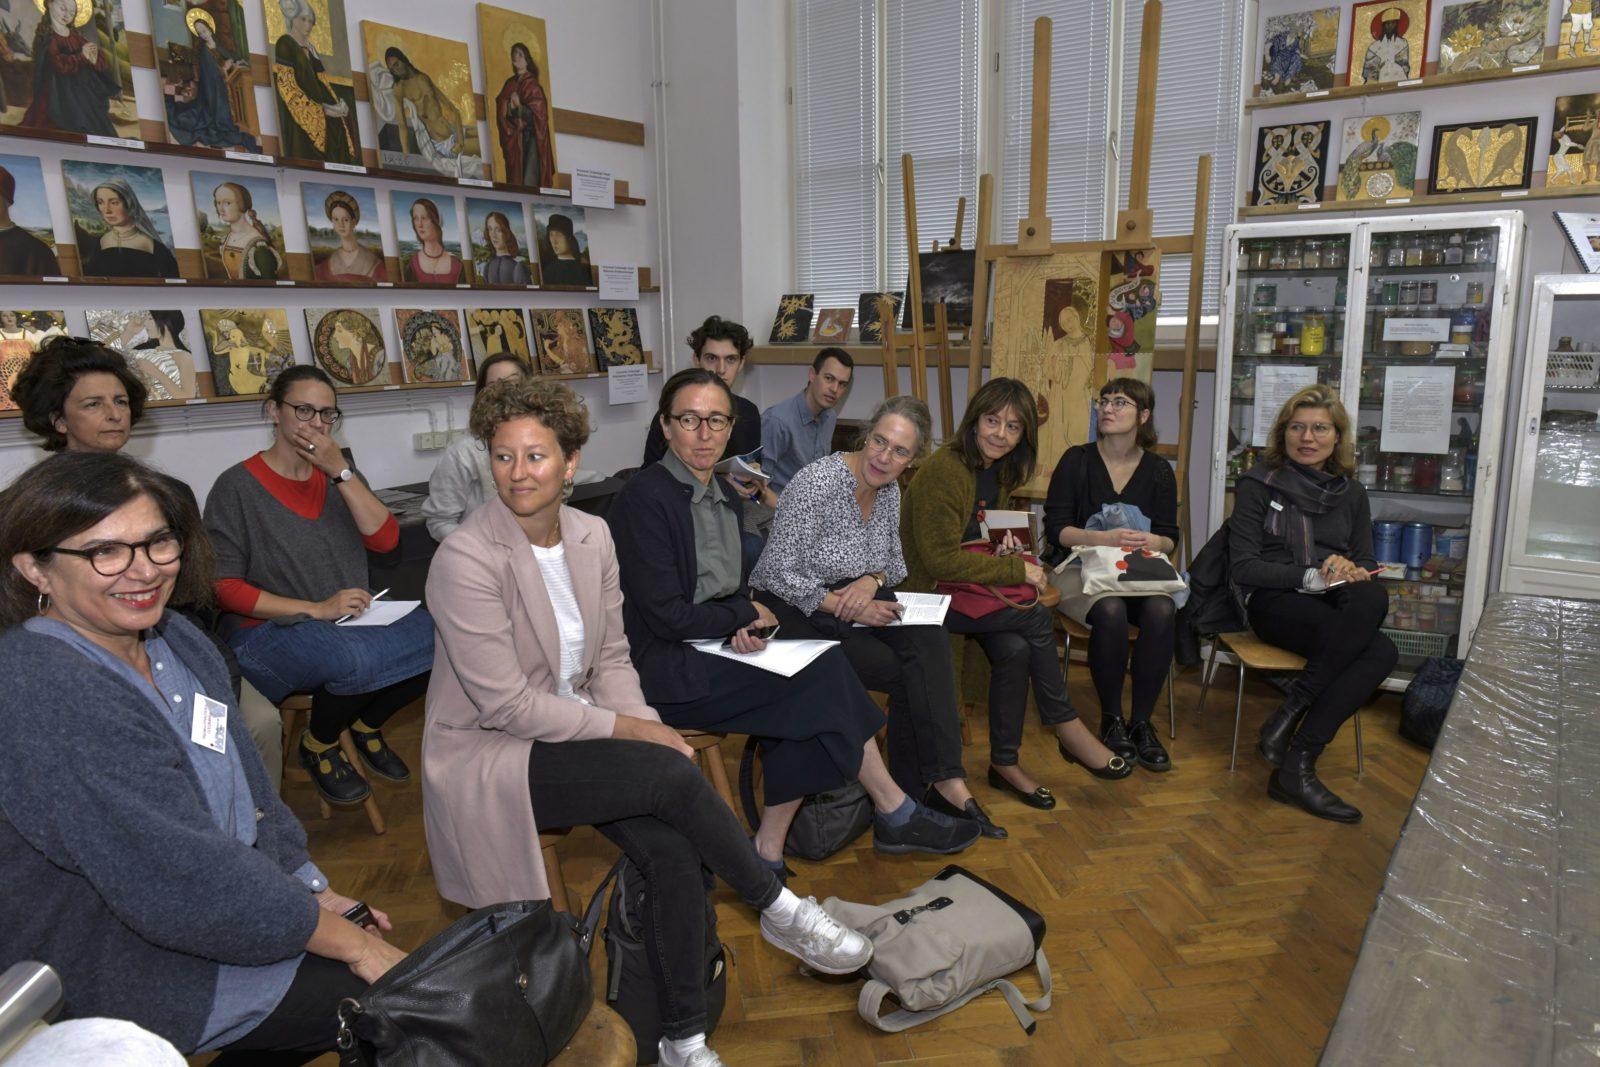 Warschau_2019_Moisture_sandwich_for_Architectural_Drawings_Warsaw_Stasiuk_Roman_202